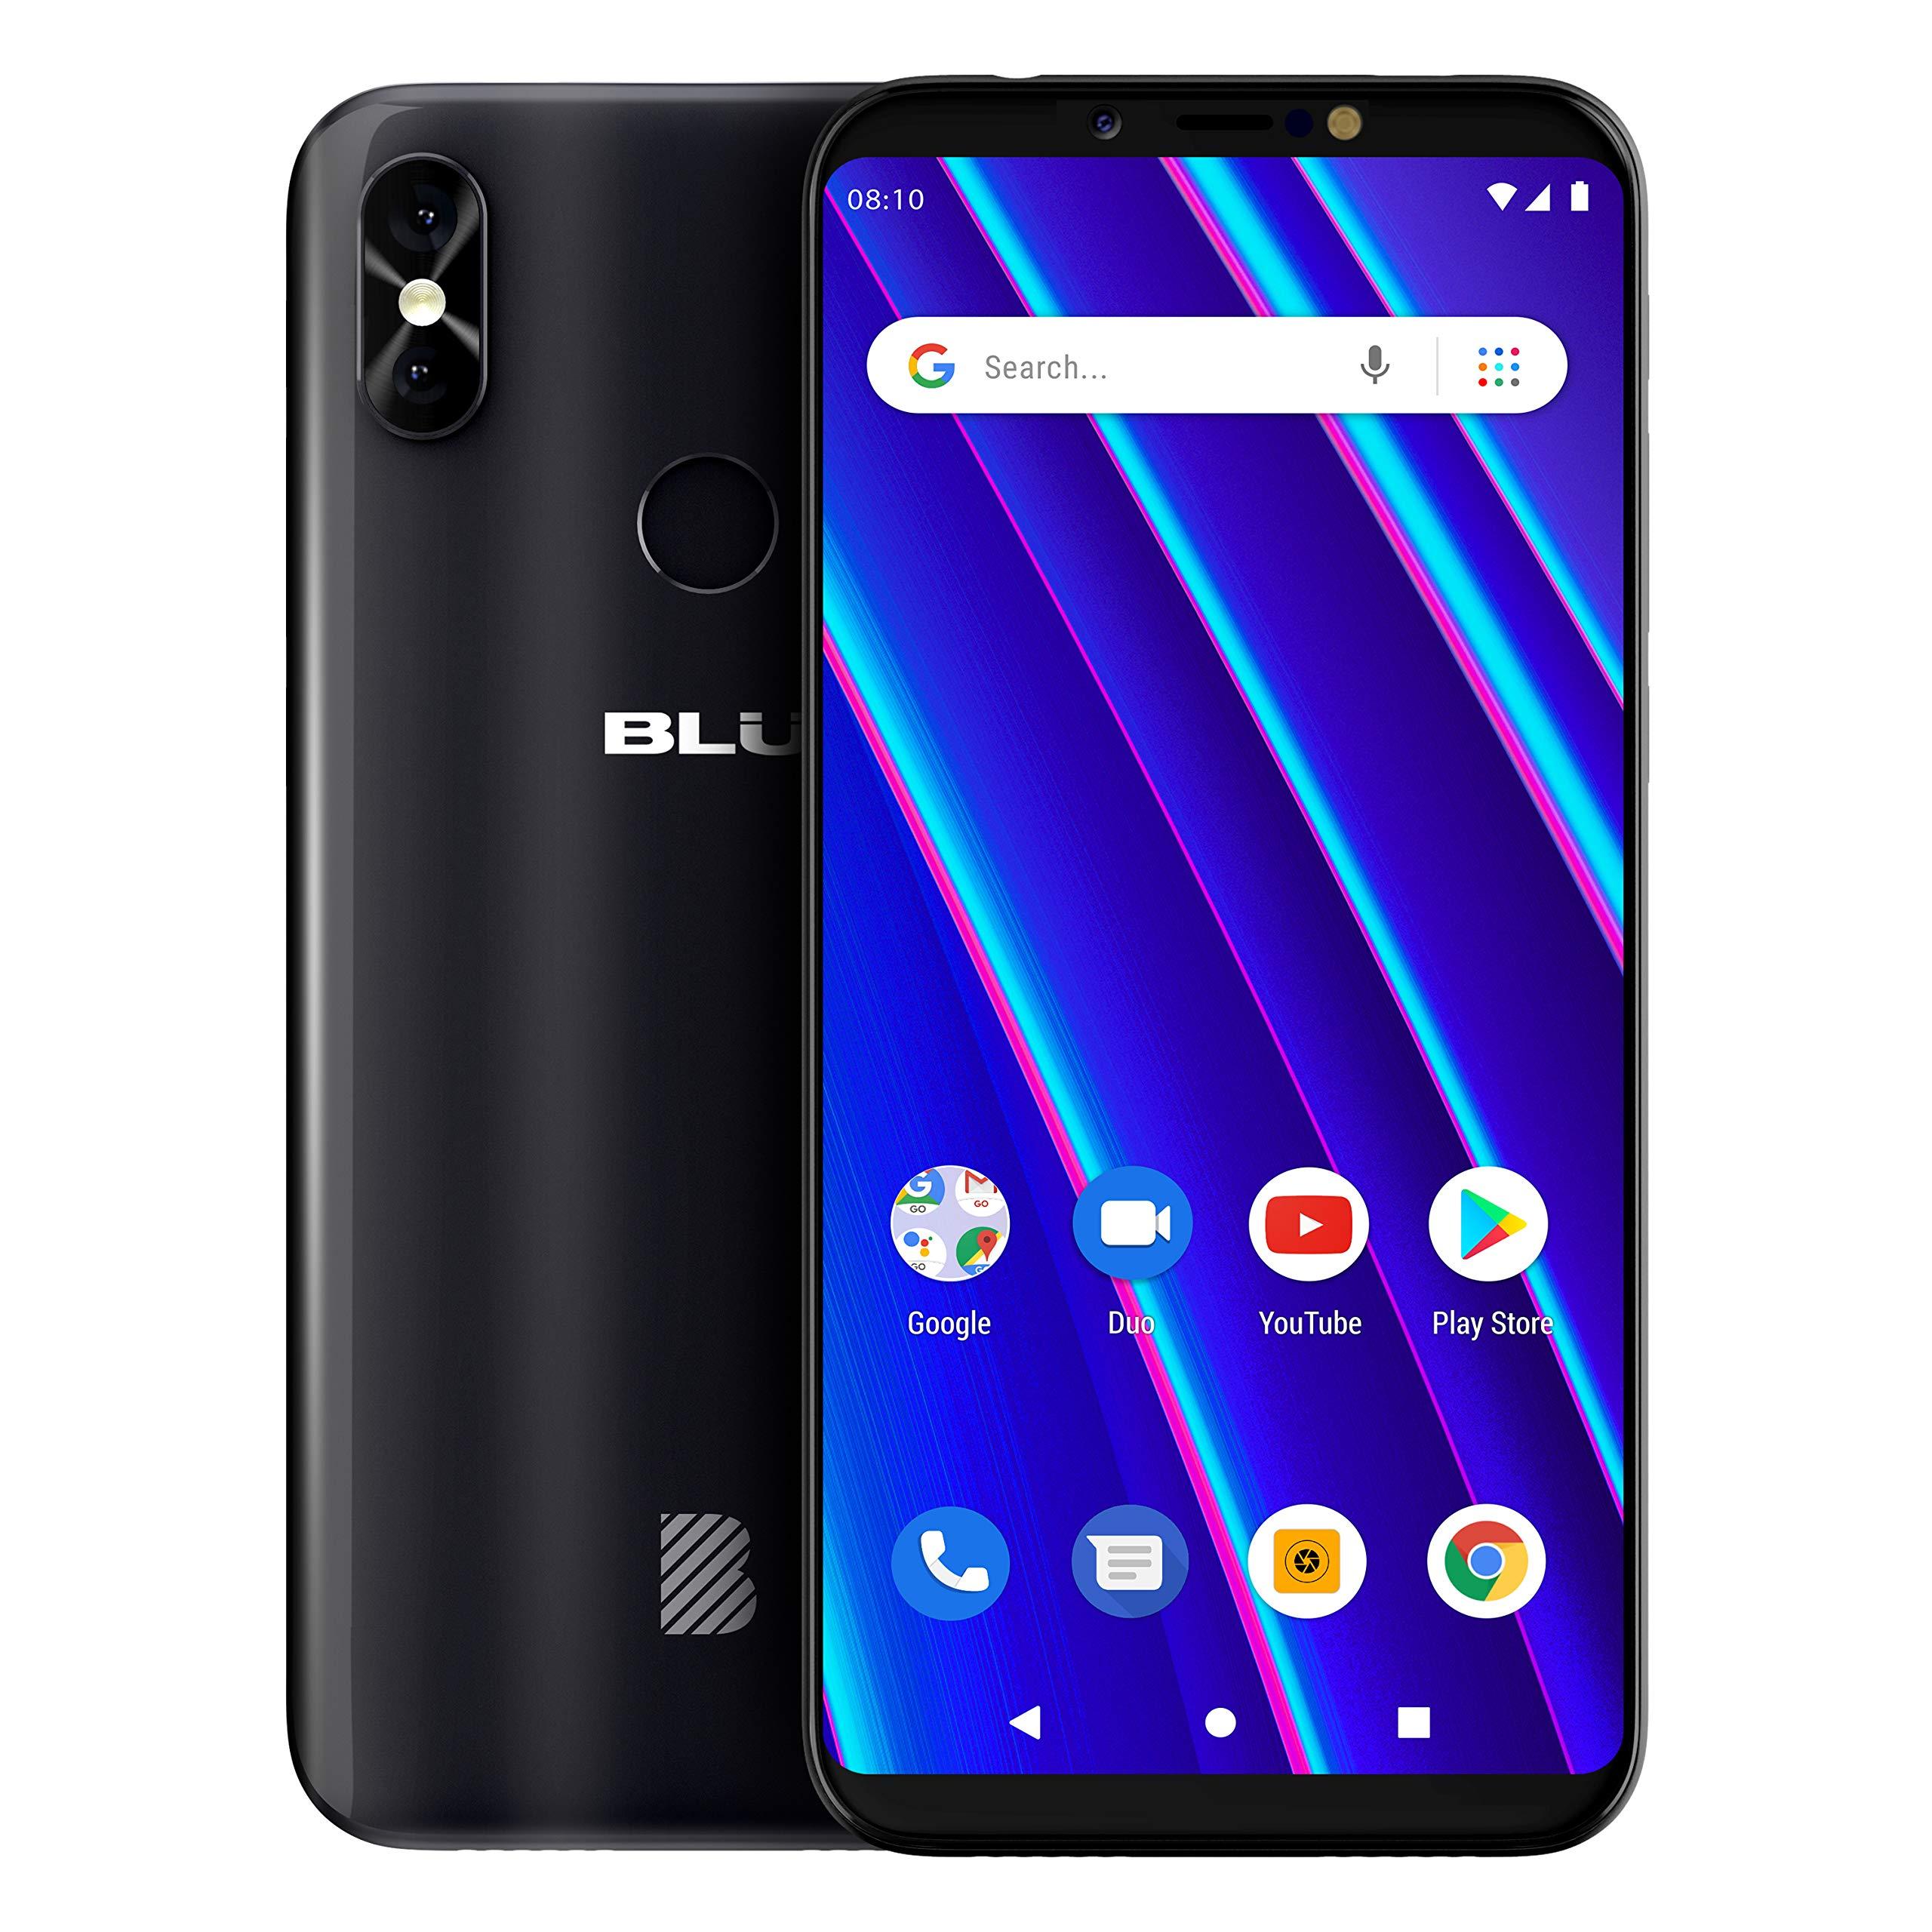 BLU Vivo Go v2.0 - Unlocked Smartphone 16GB+1GB RAM -Black by BLU